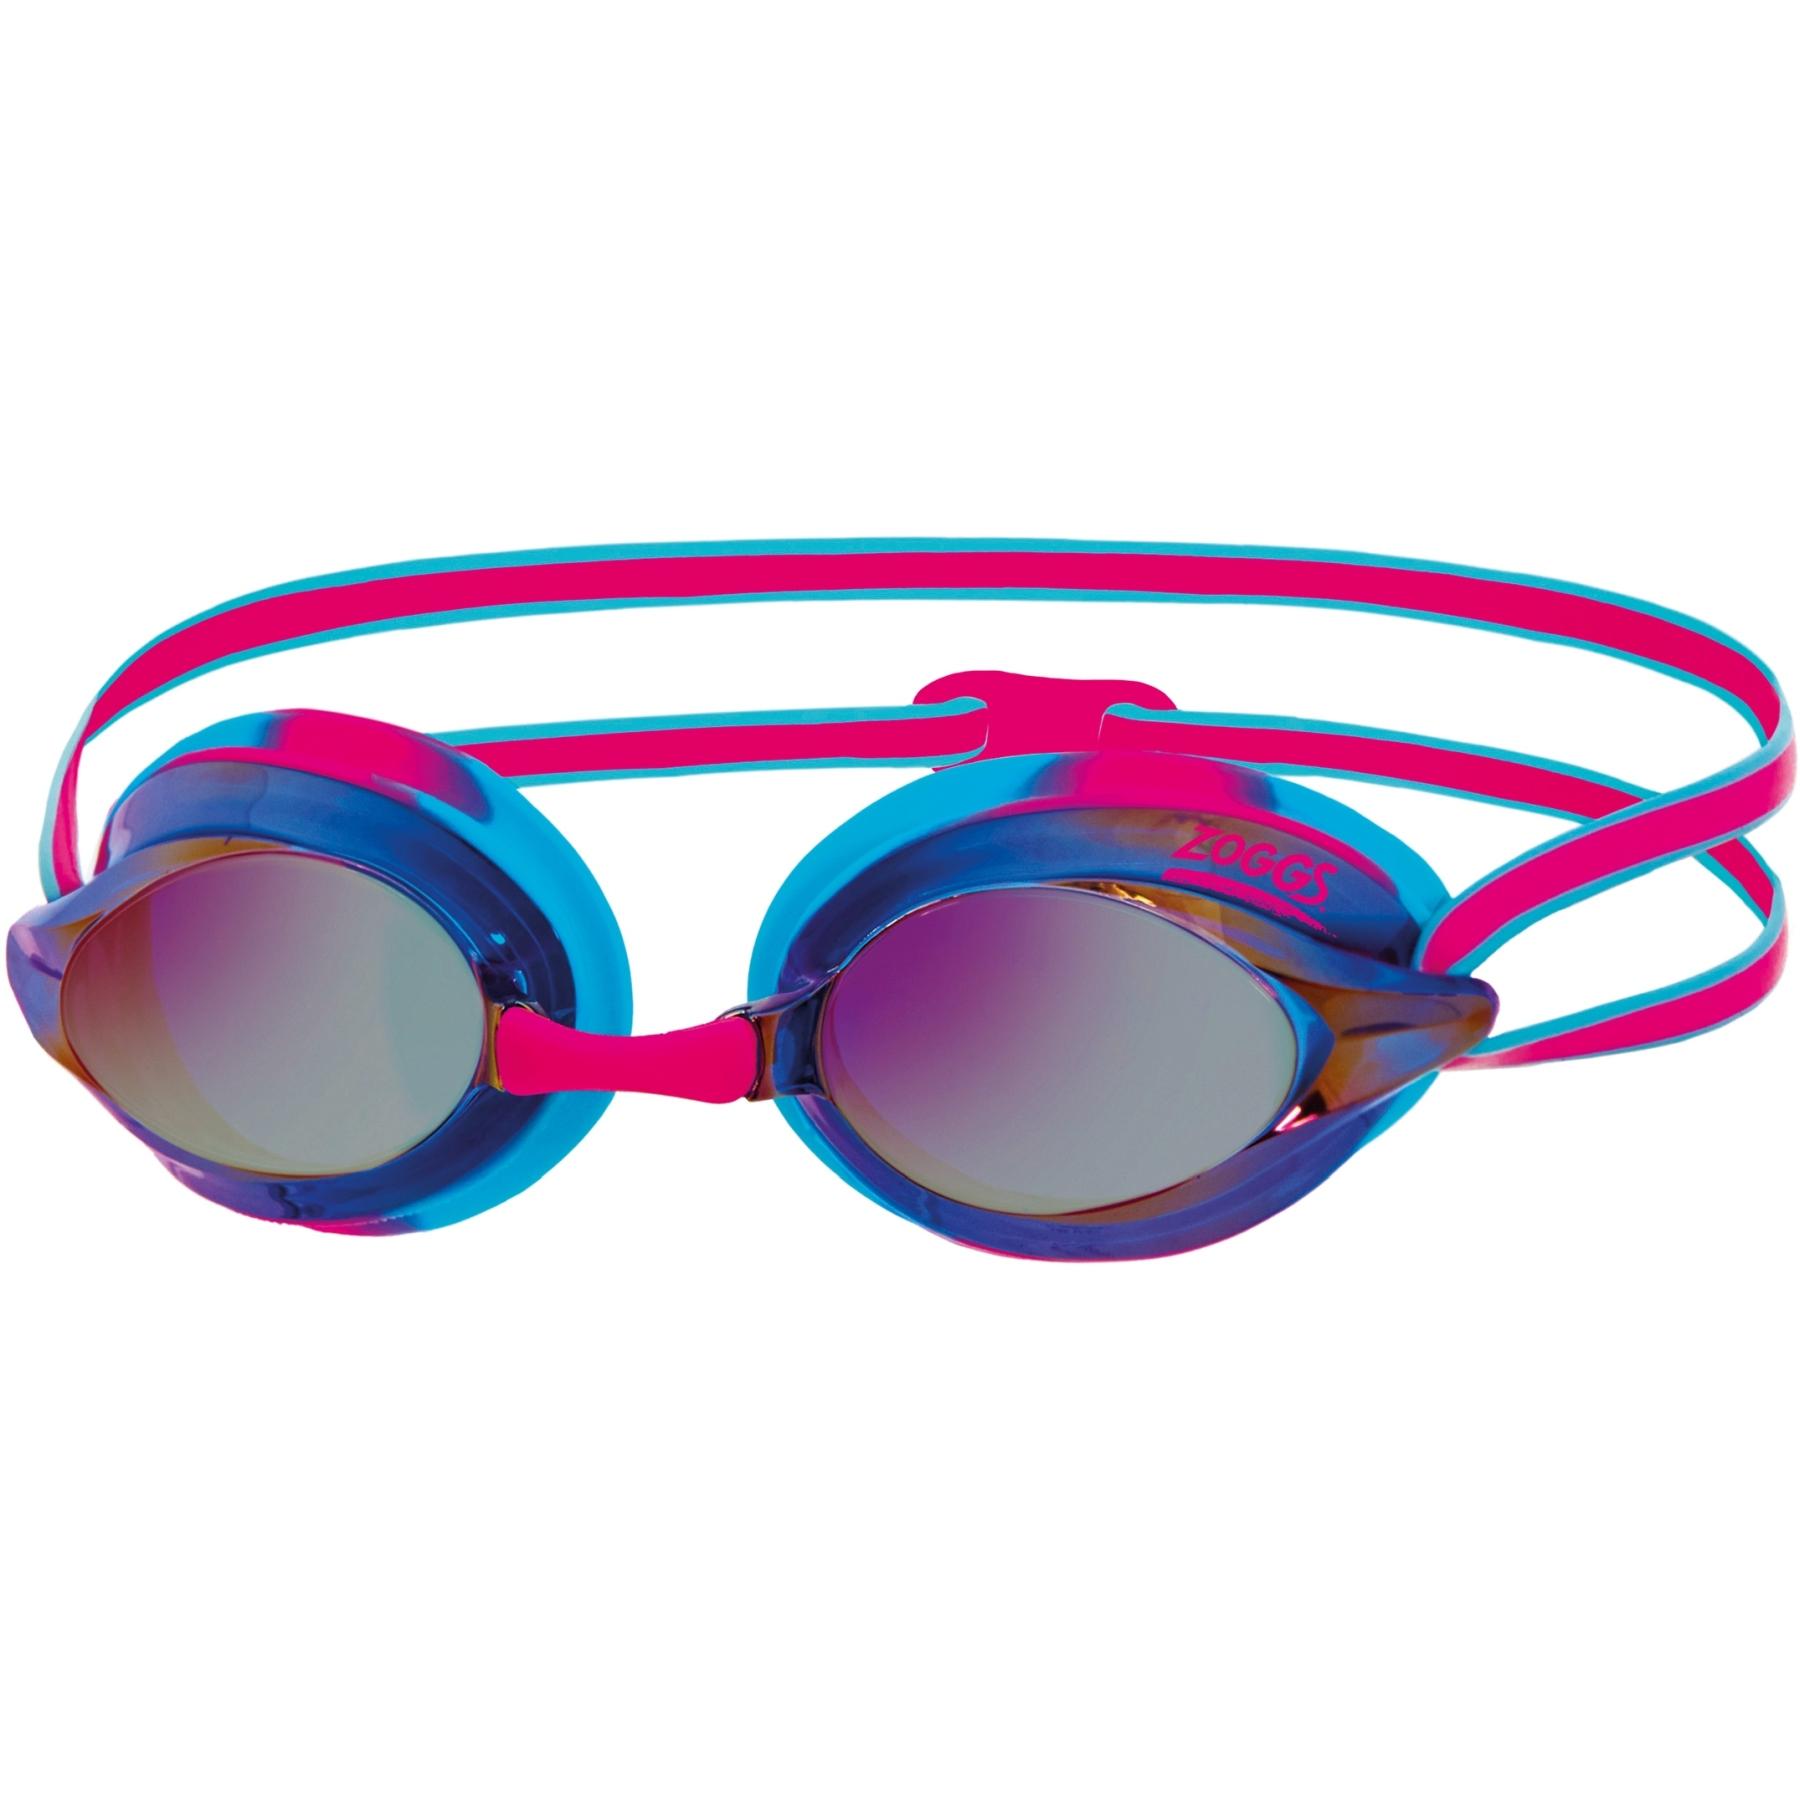 Zoggs Racespex Mirror Schwimmbrille - blue/pink/mirrored